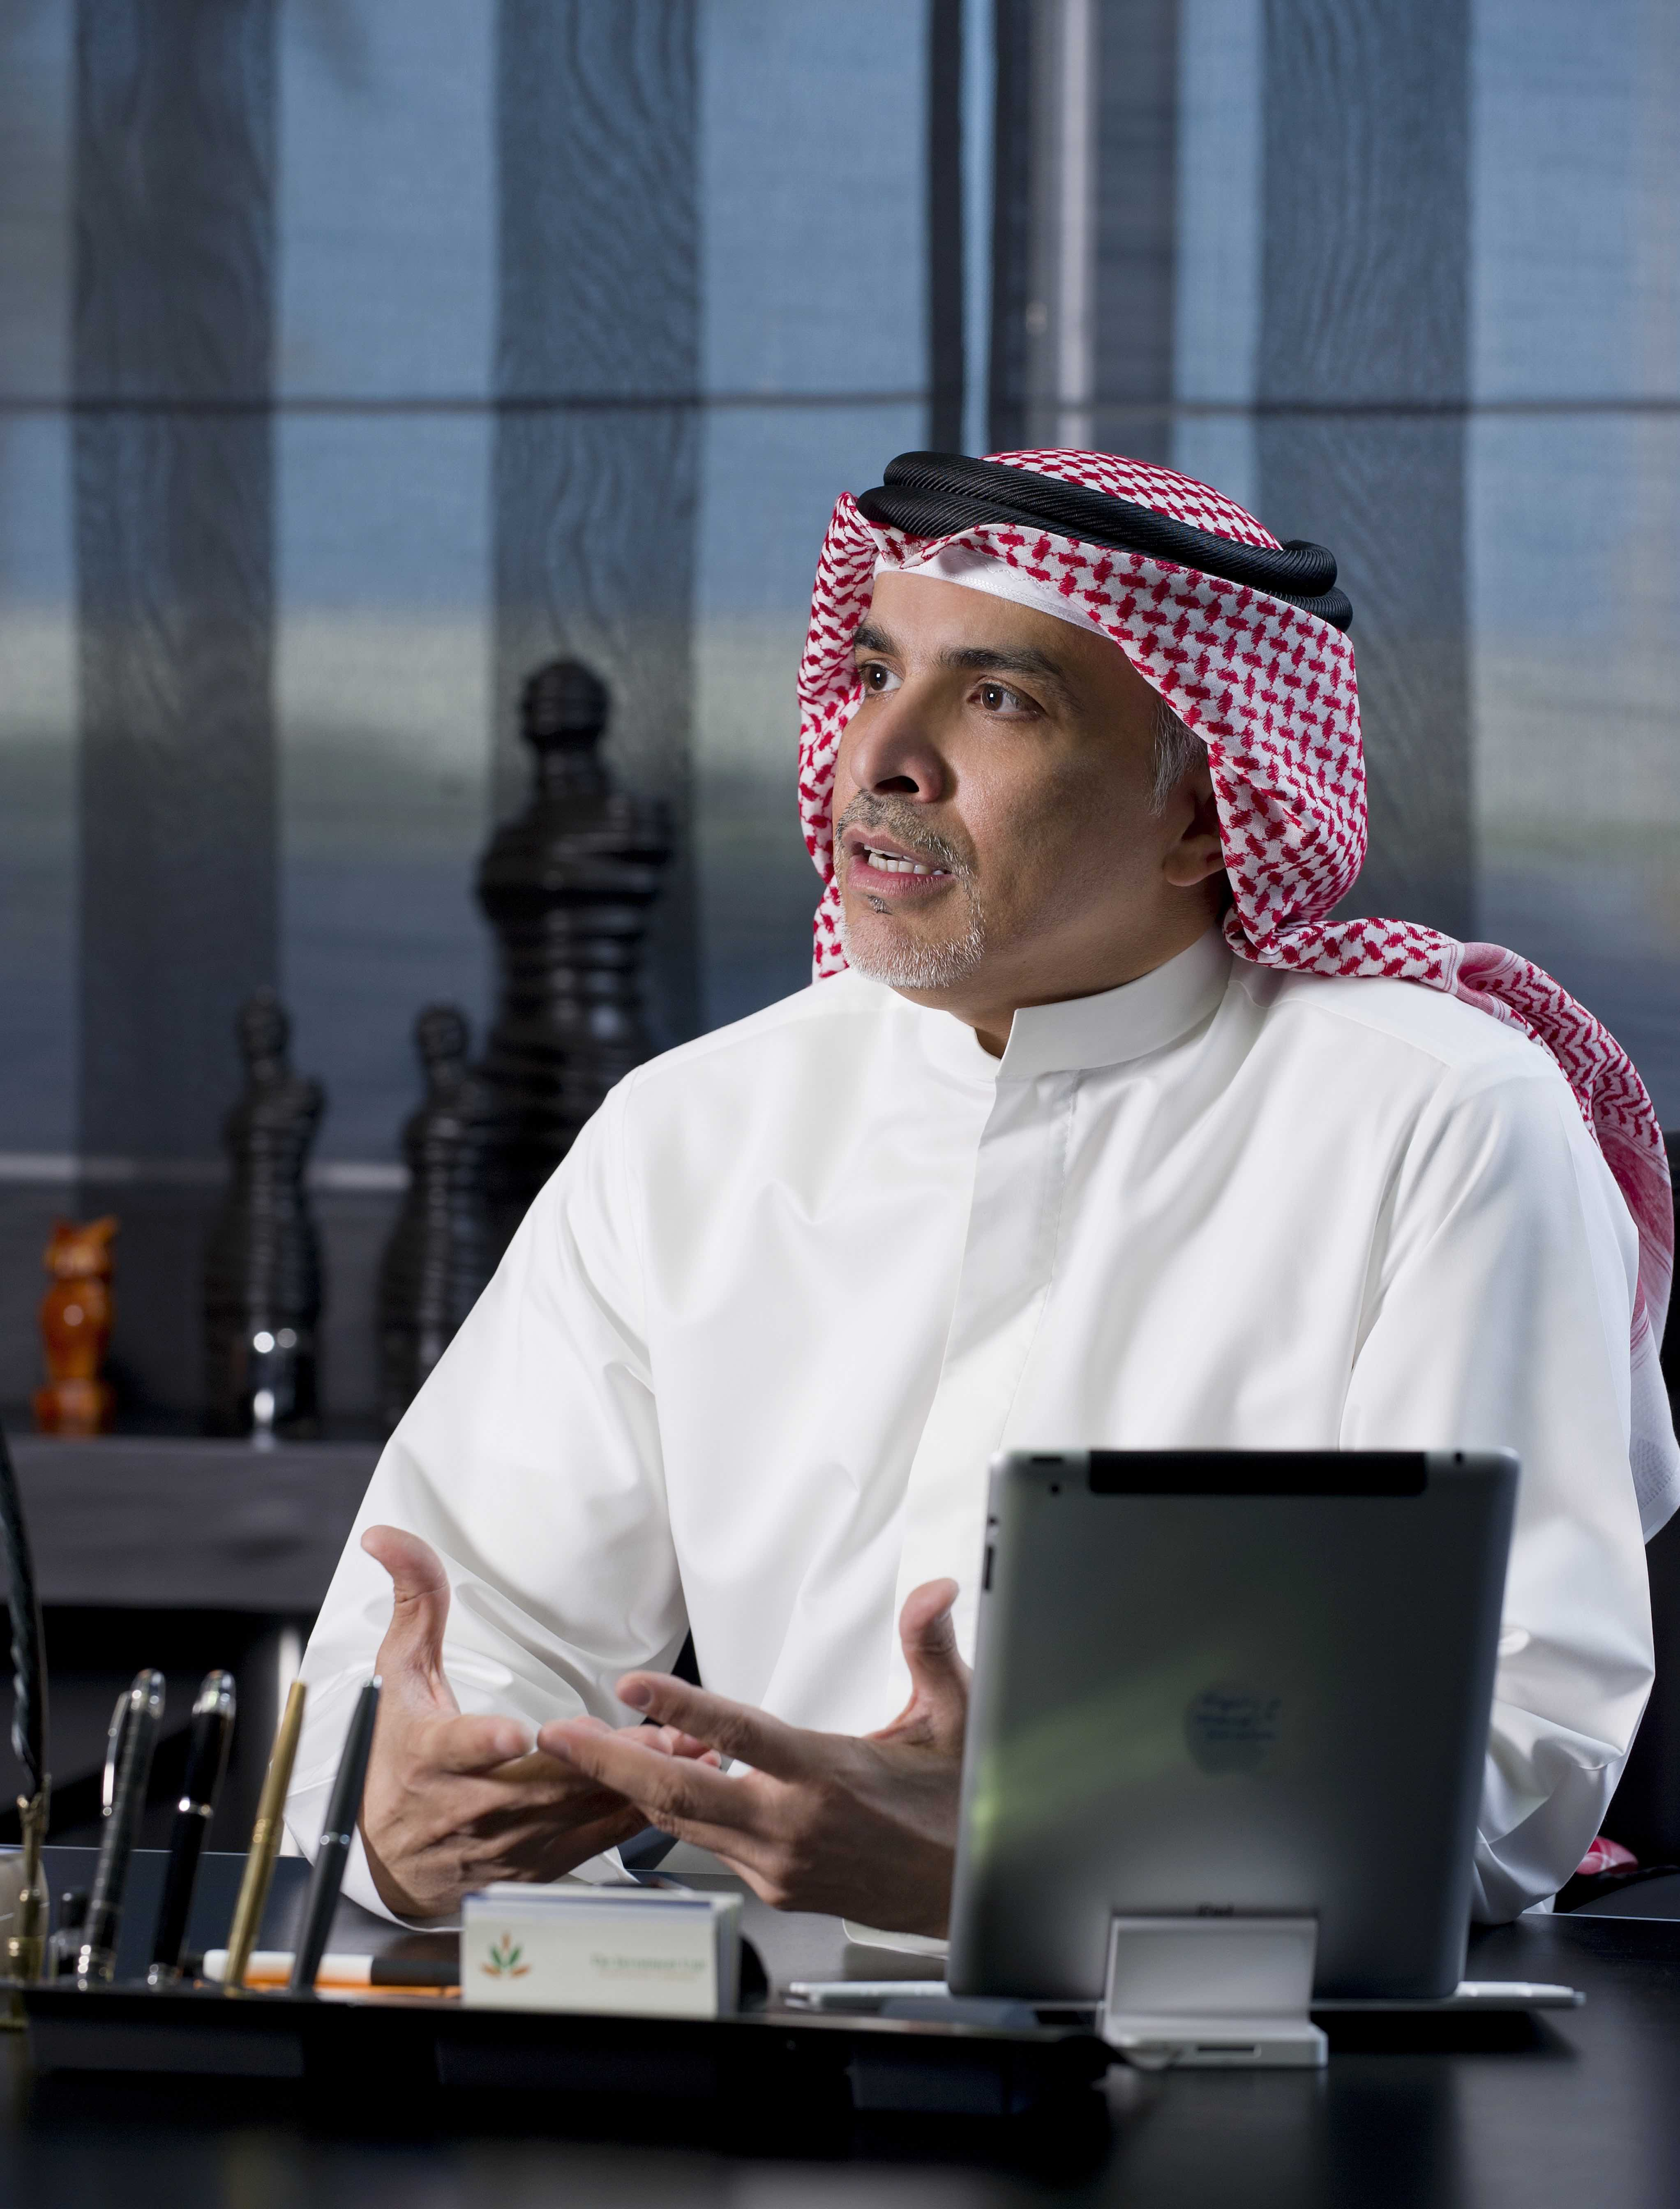 Meet The Emirati Entrepreneur Spearheading the UAE Date Production Industry